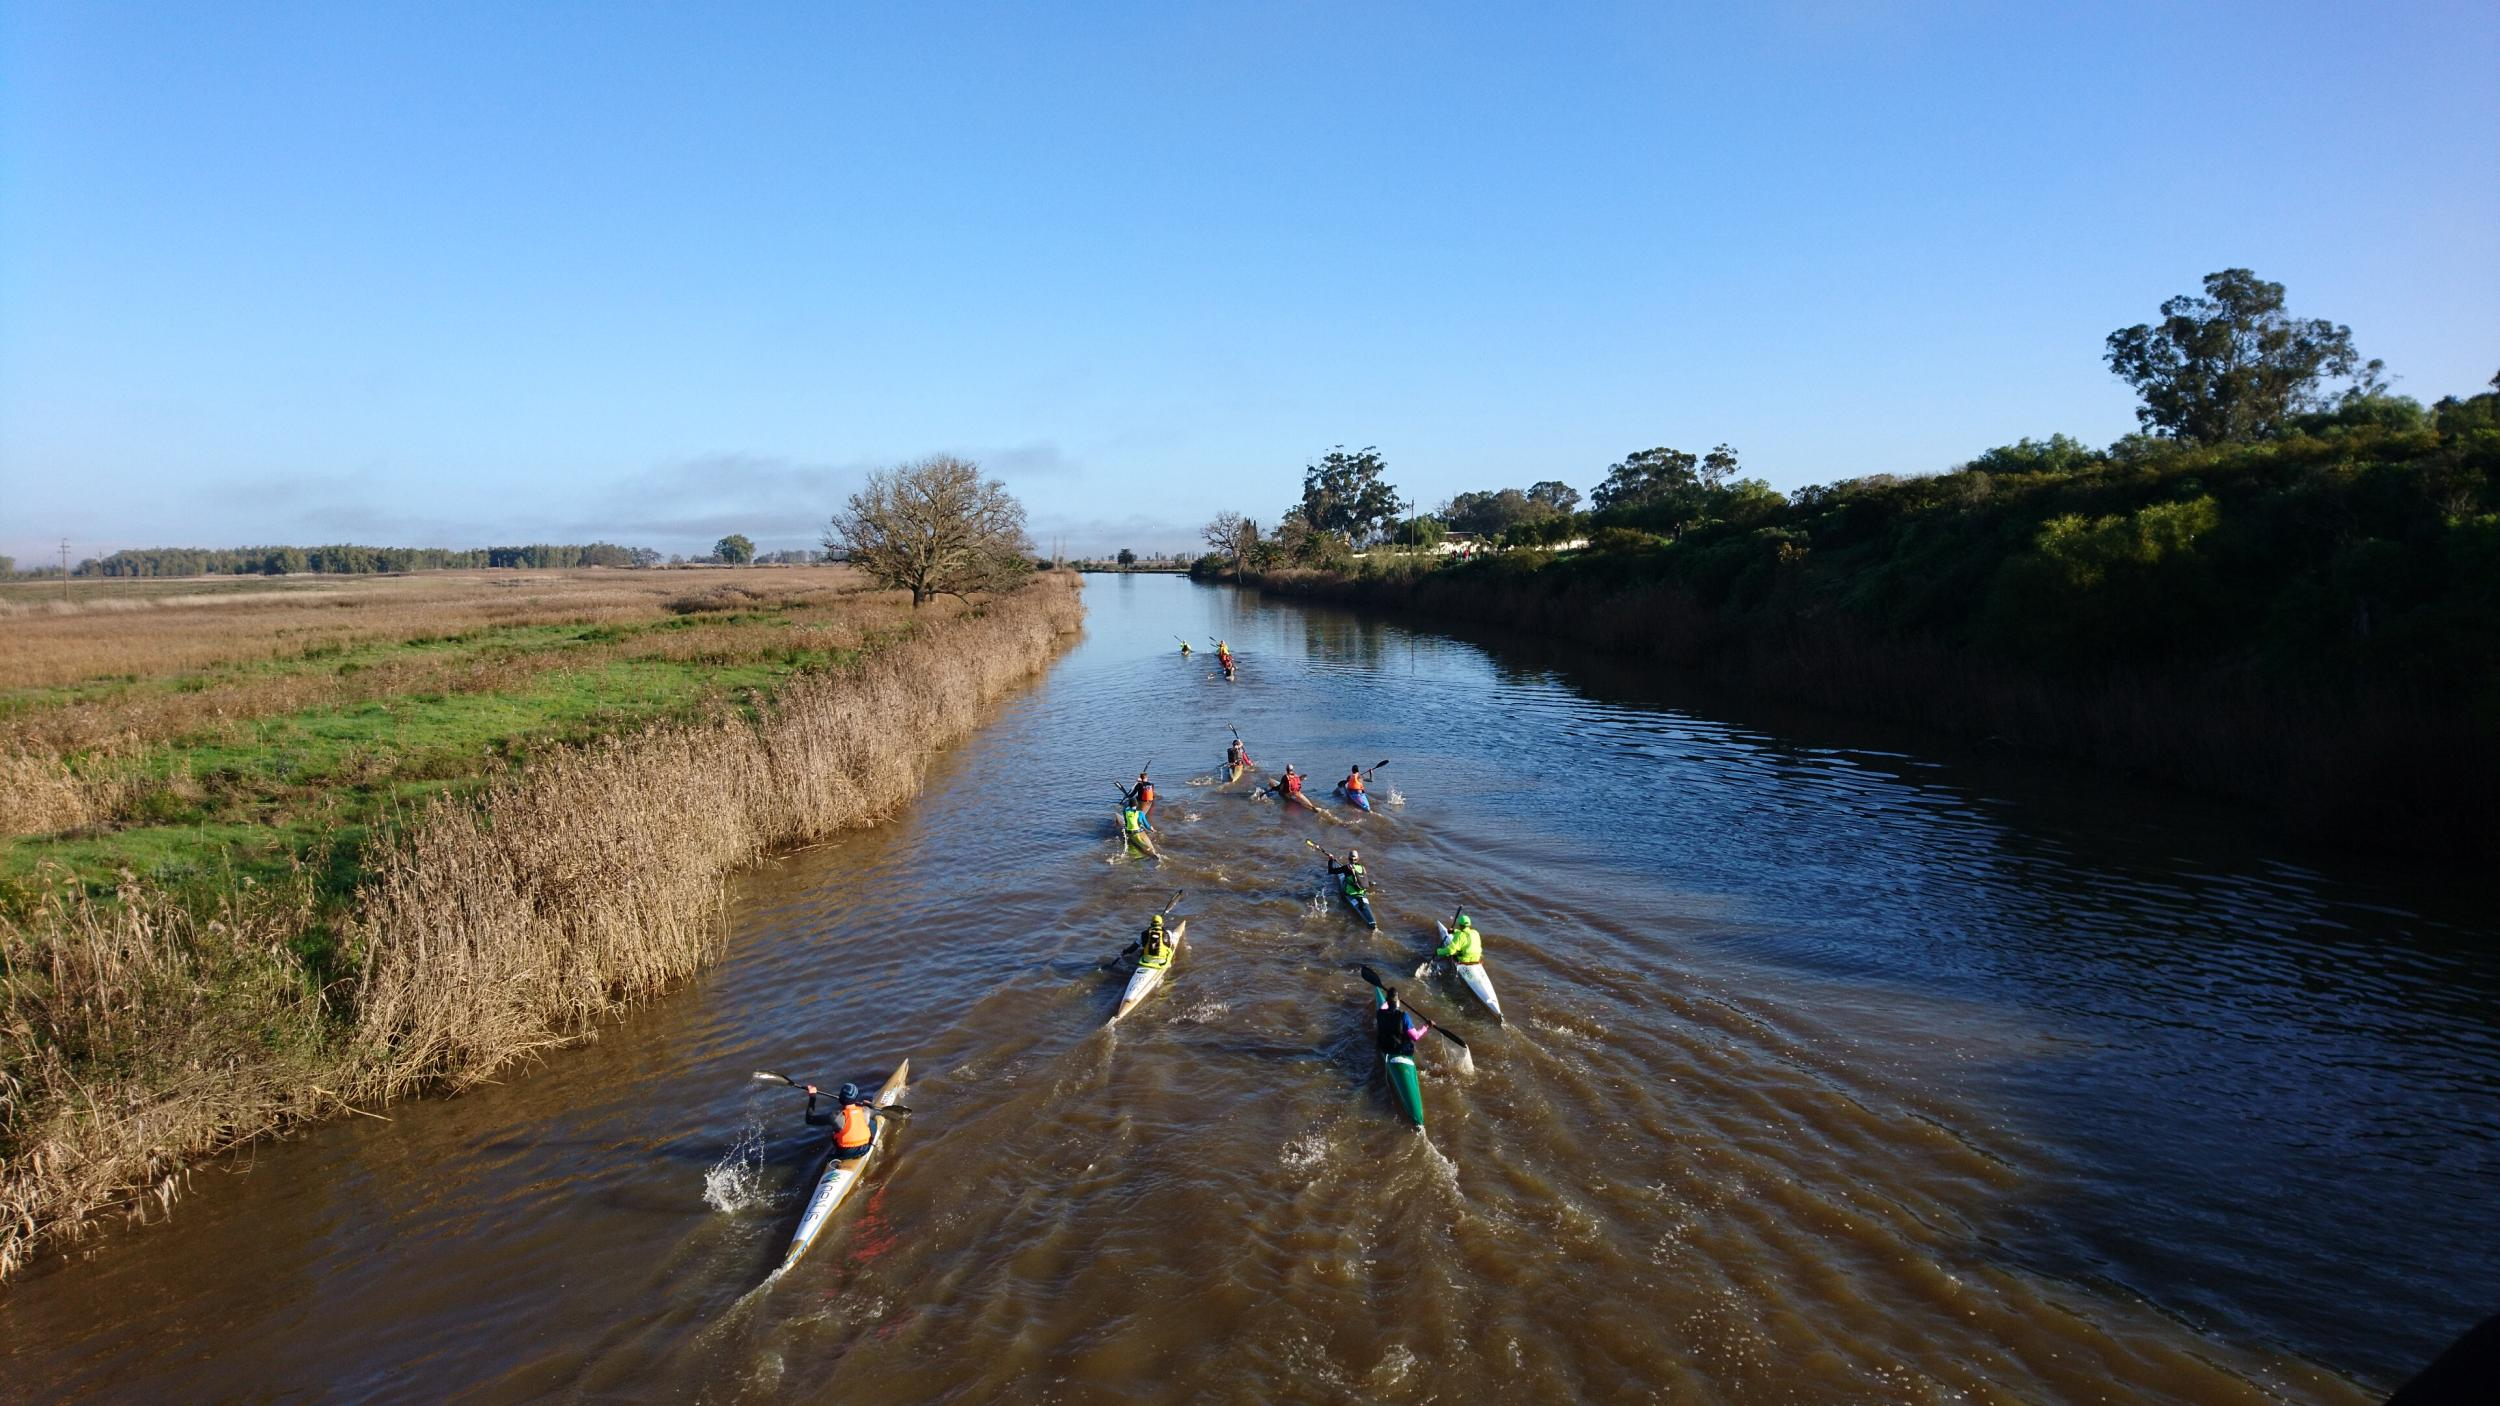 Ultra Paddle replaces 2020 Berg River Canoe Marathon